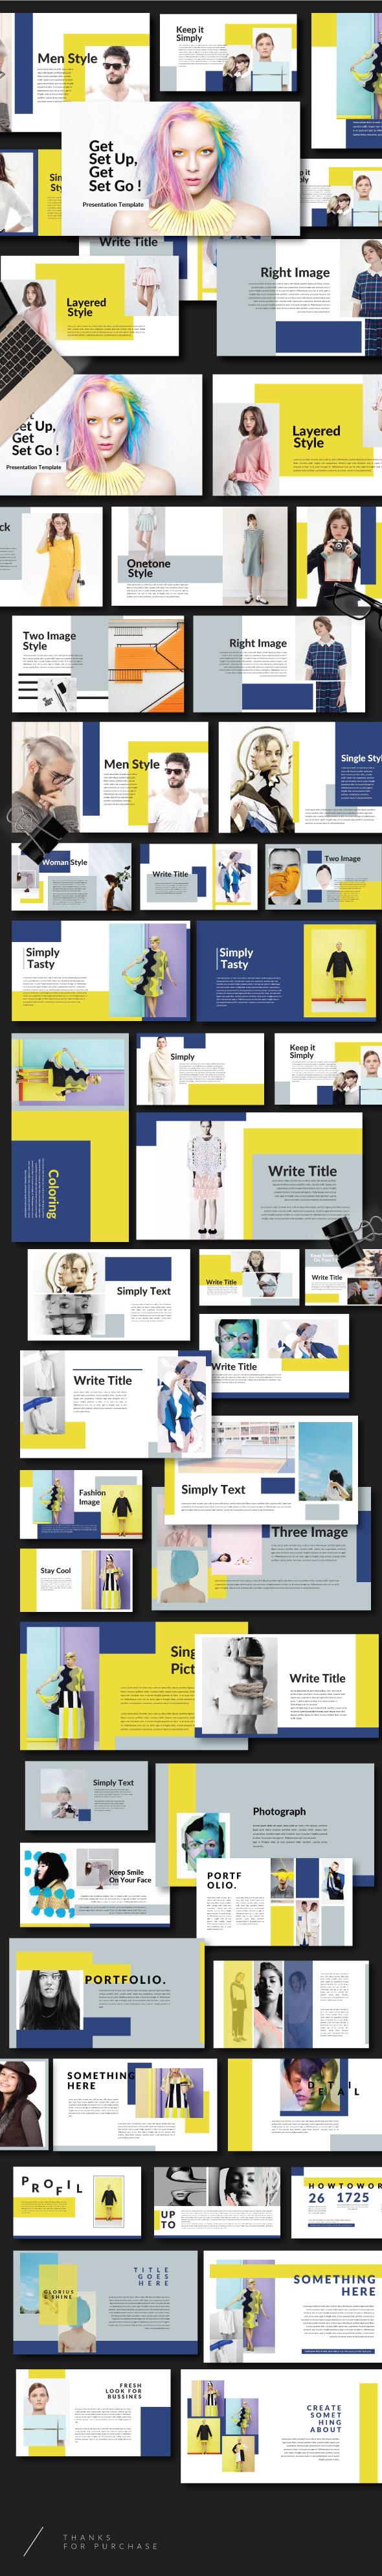 Pastel Minimal Powerpoint Template - Creative PowerPoint Templates